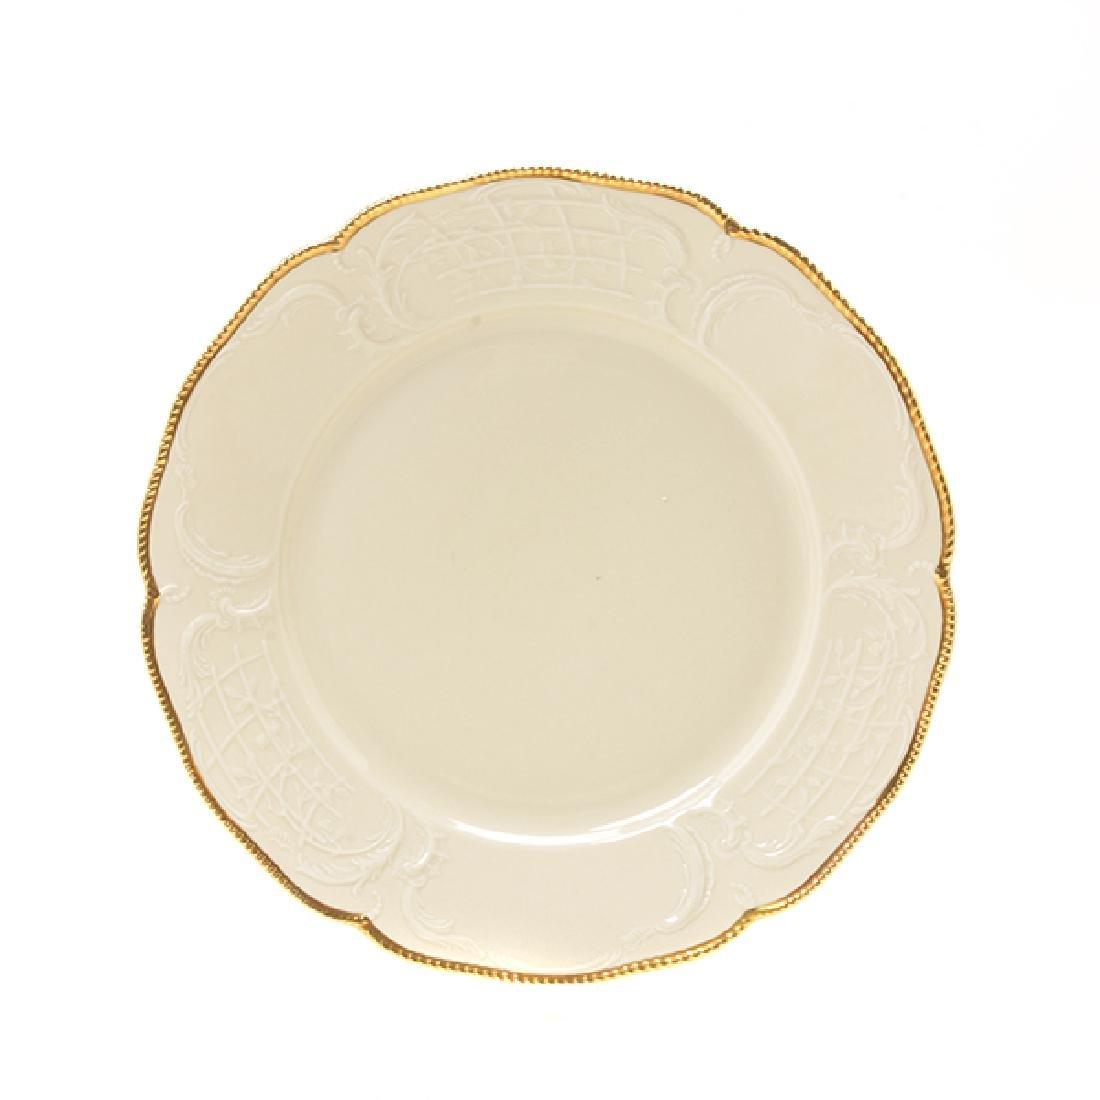 Rosenthal Sans Souci Porcelain Dinner Service - 2